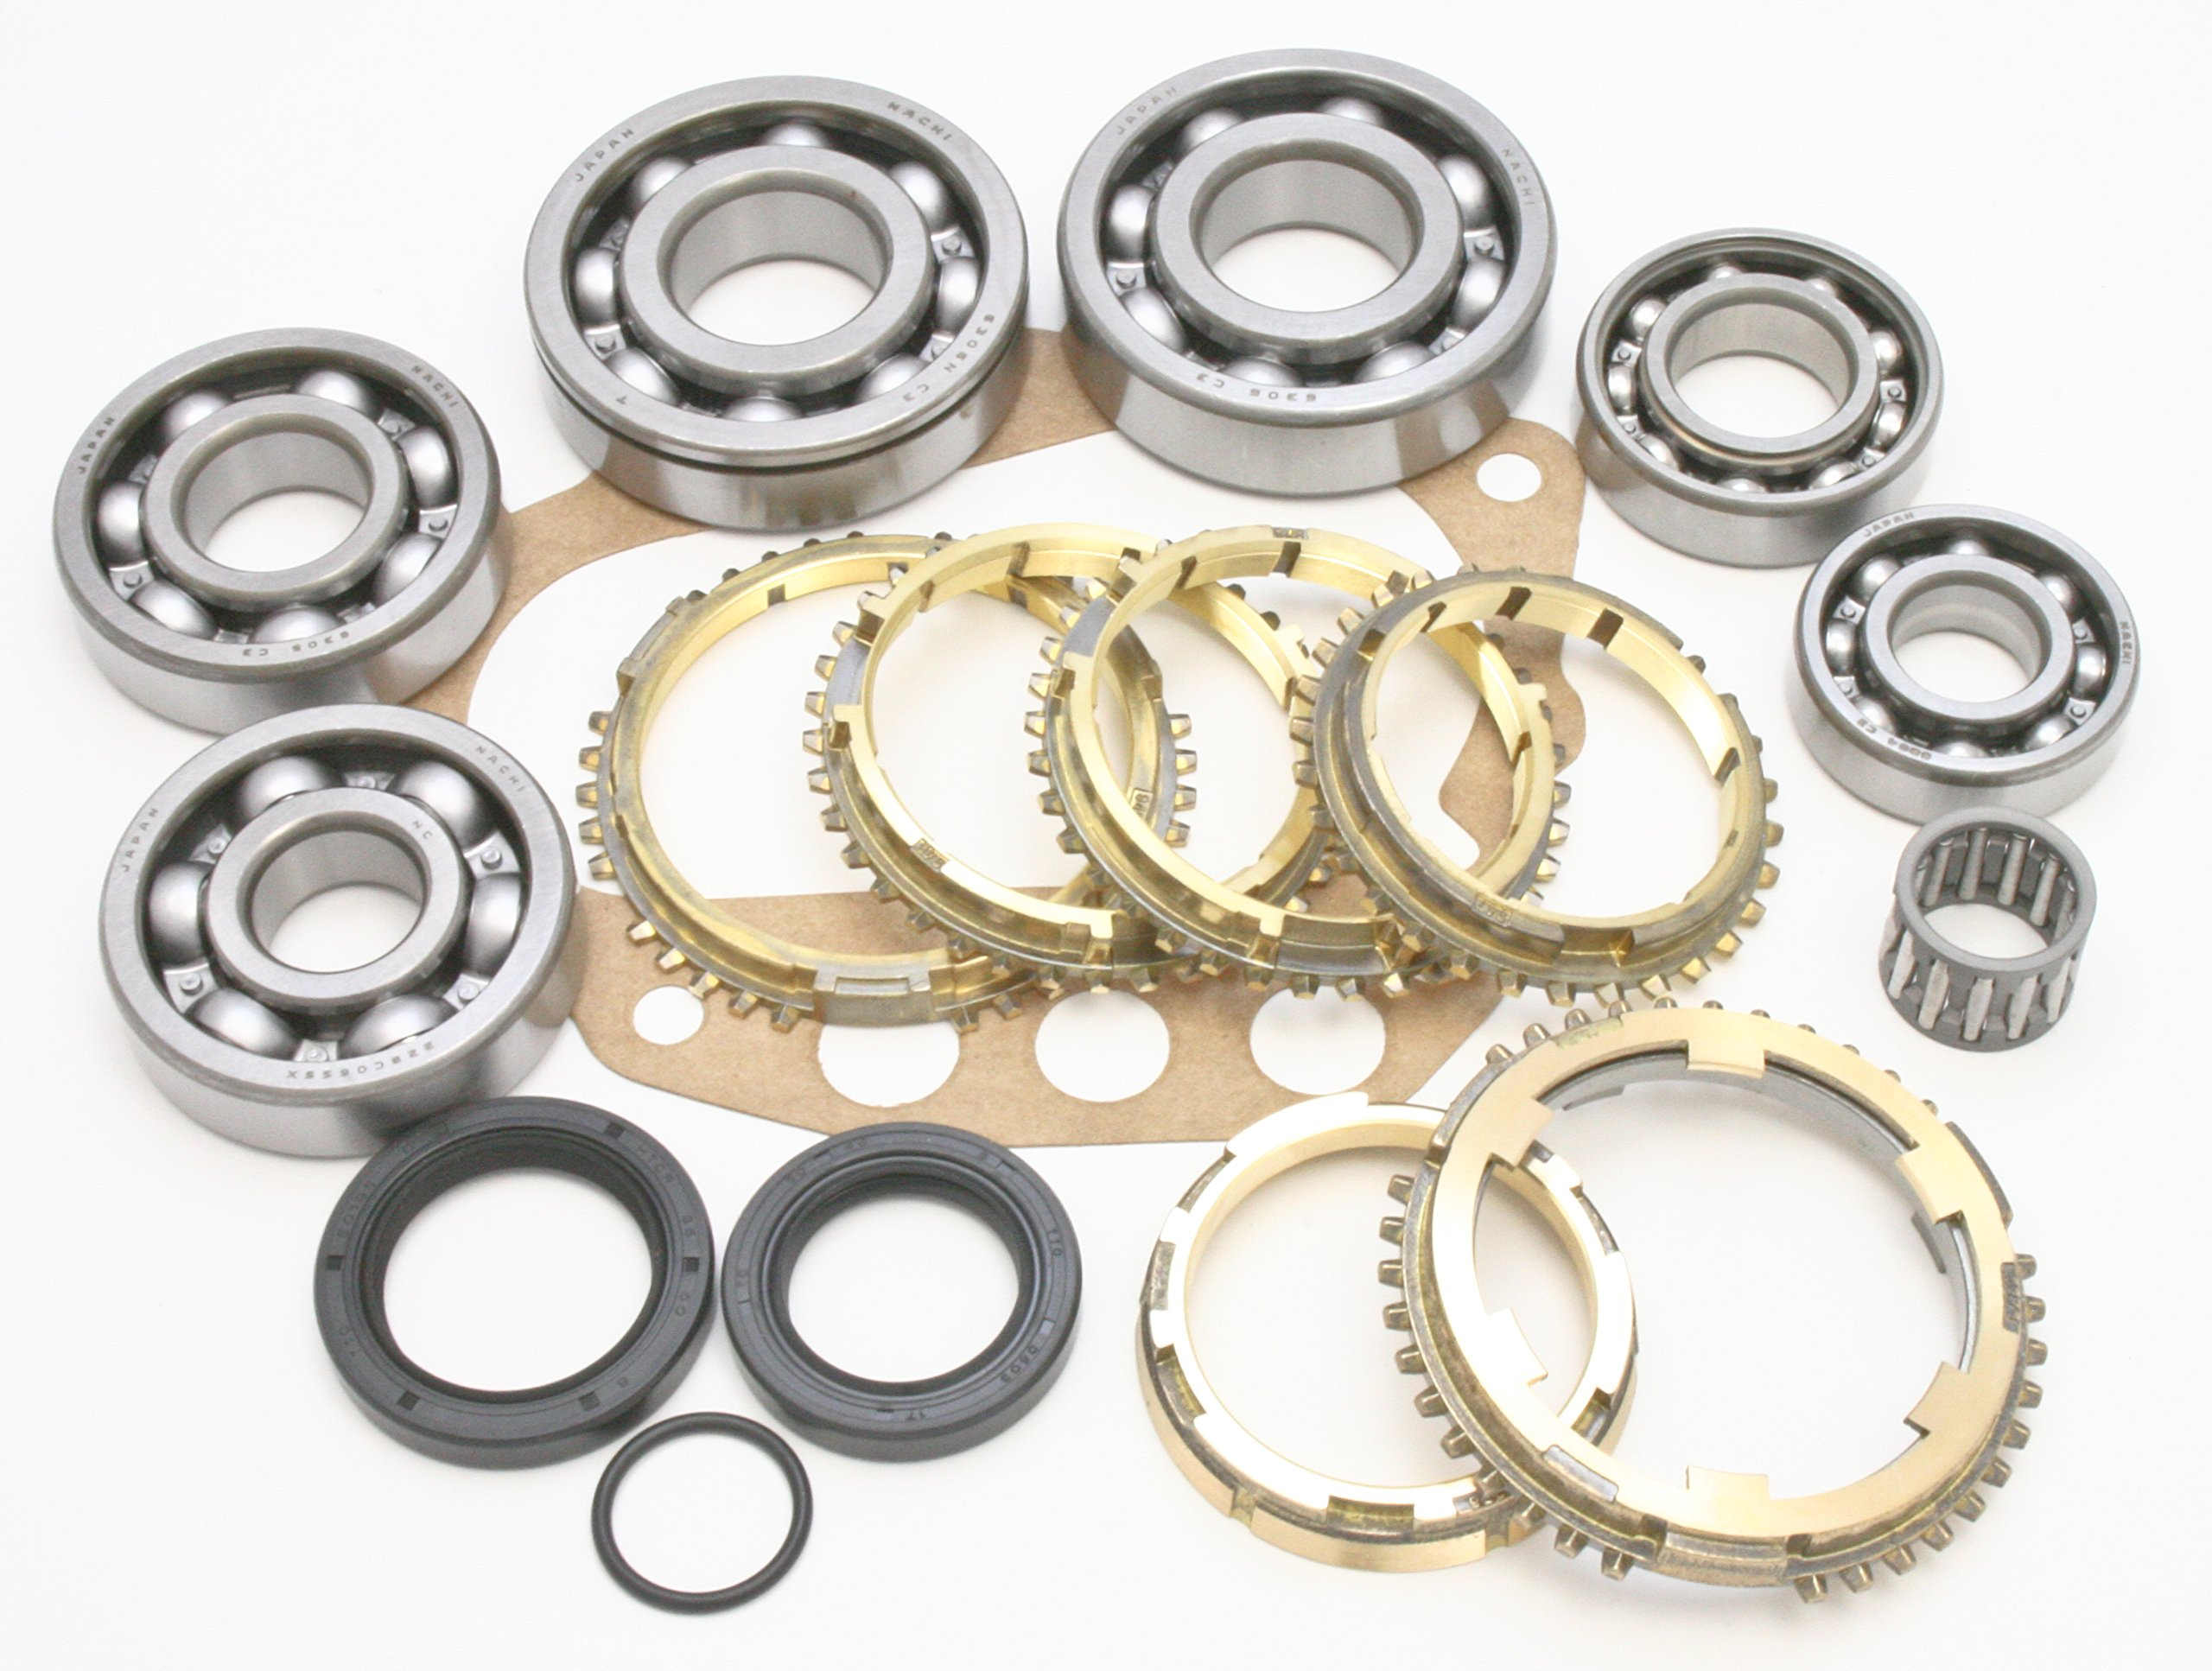 Transparts Warehouse BK133BWS Nissan 5 Speed Transmission Rebuild Kit with Rings